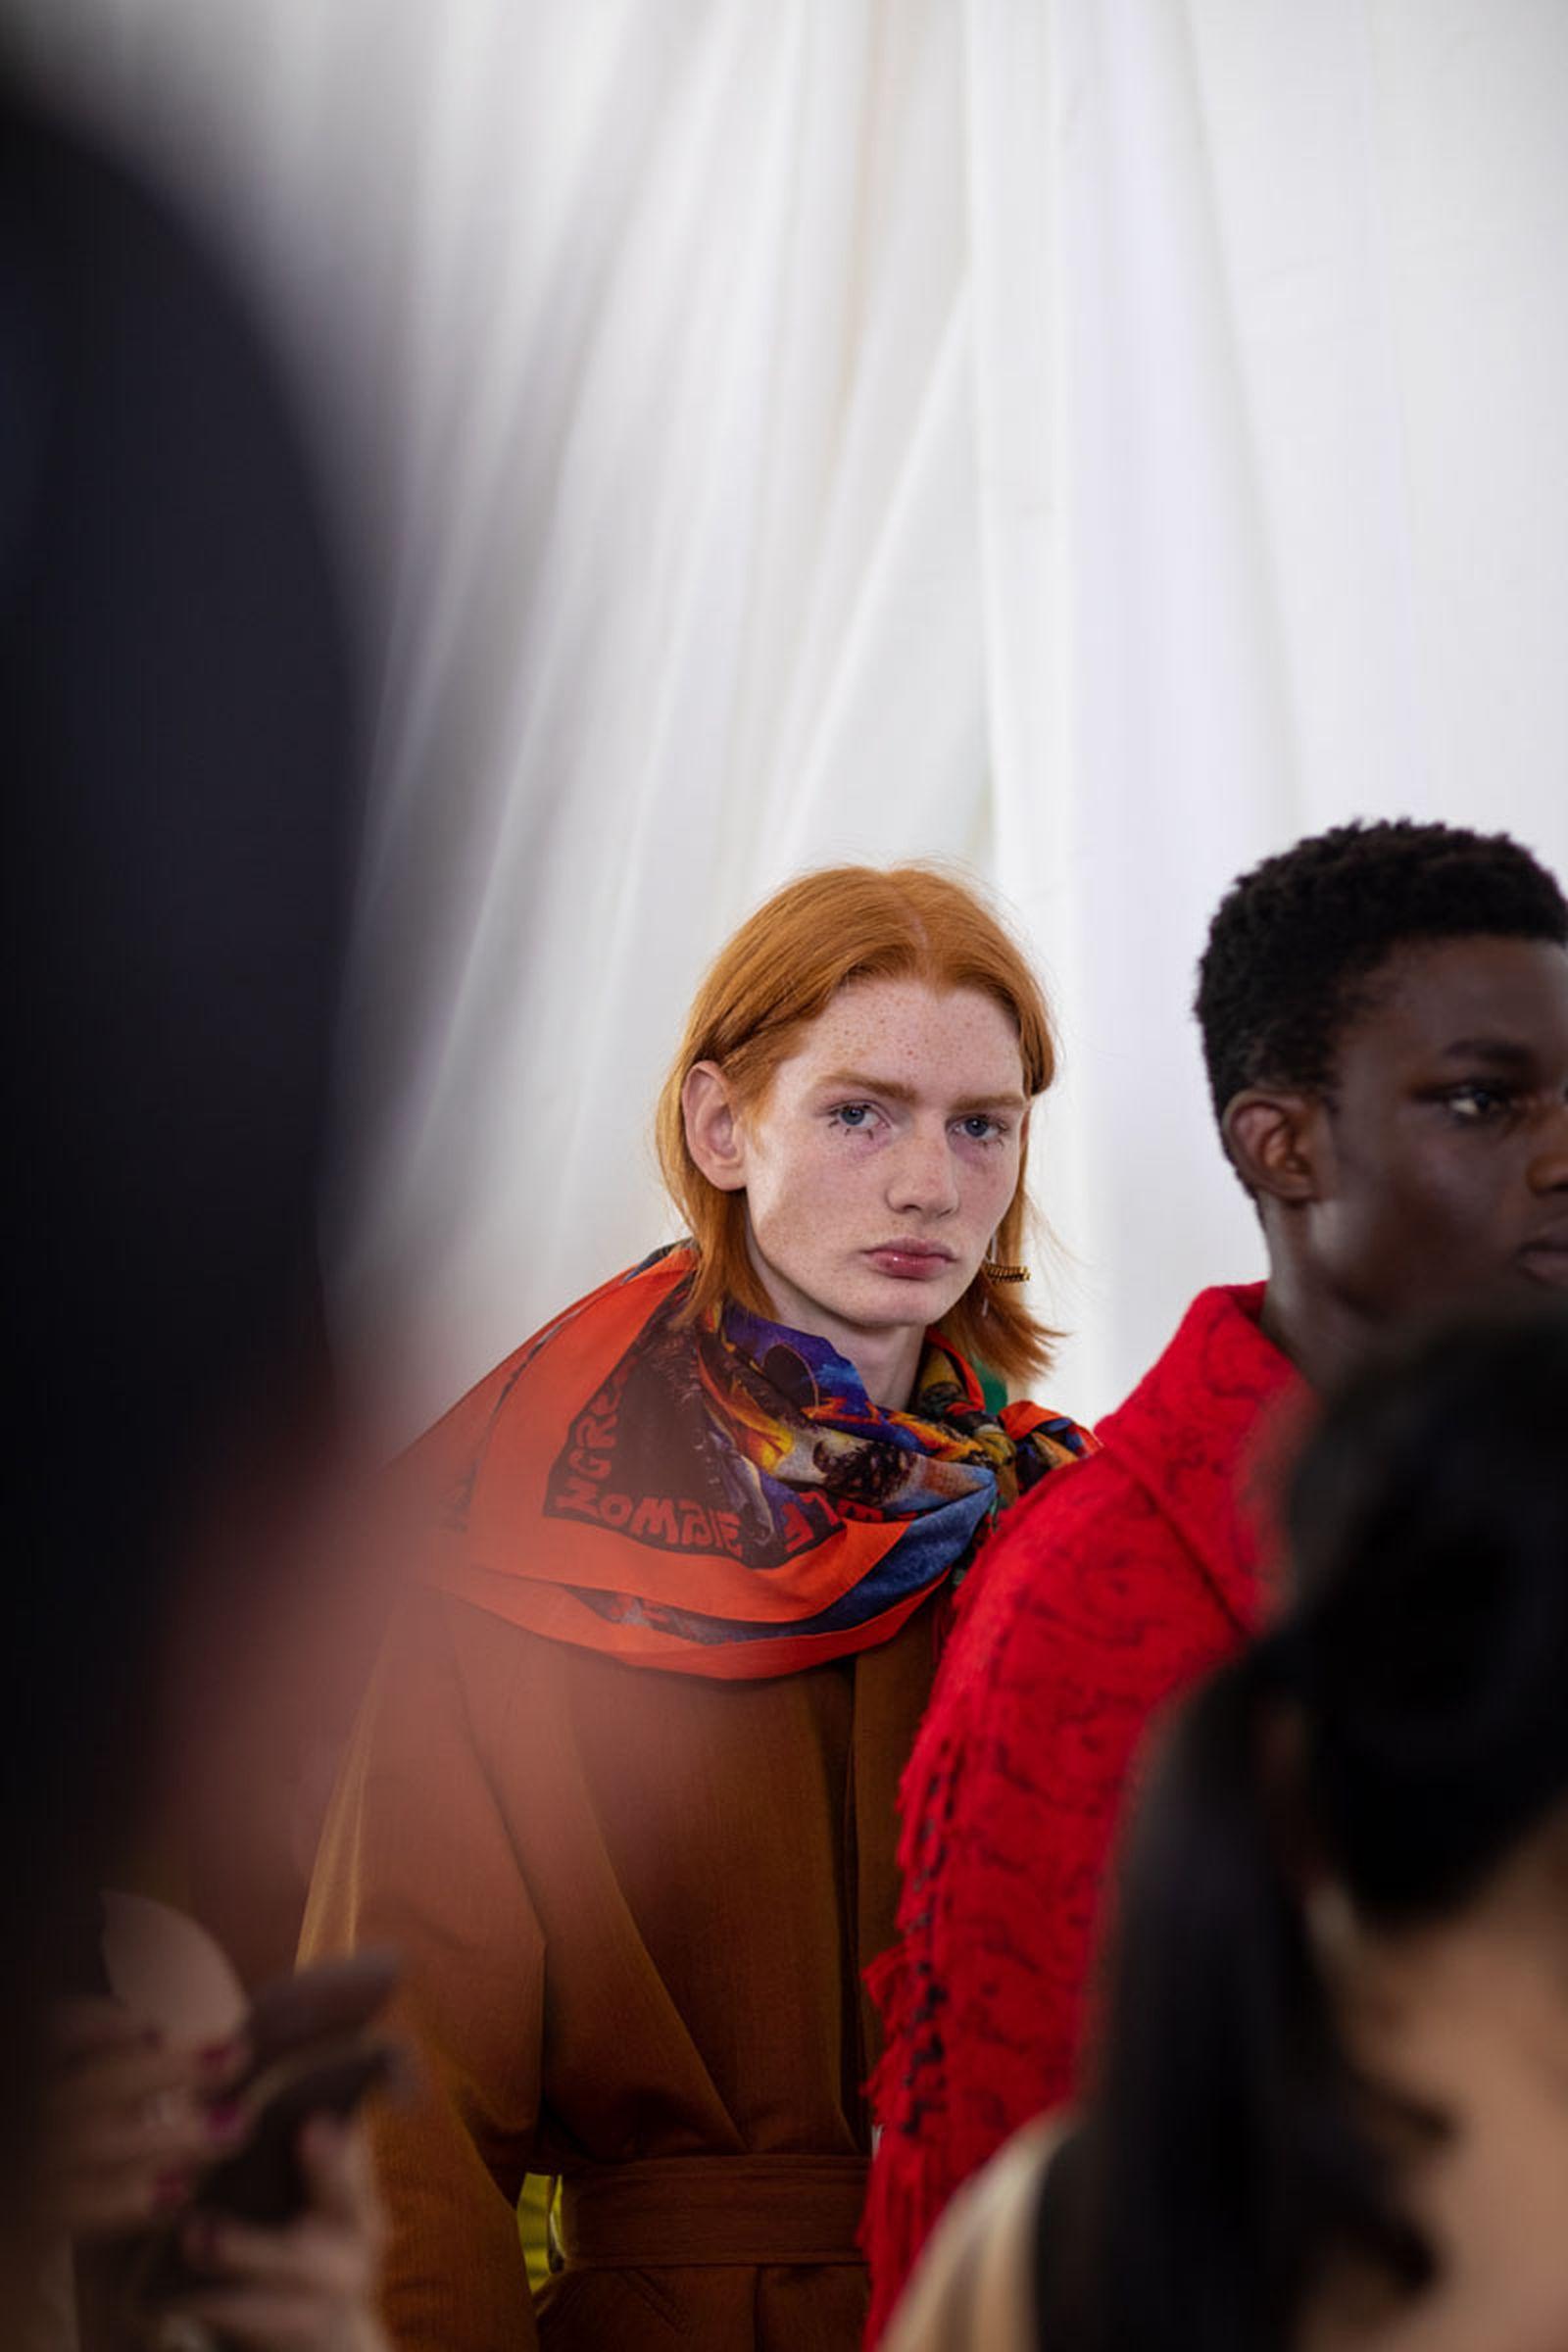 Paris AcneStudios EvaAlDesnudo ForWeb 17 Acne Studios paris fashion week runway